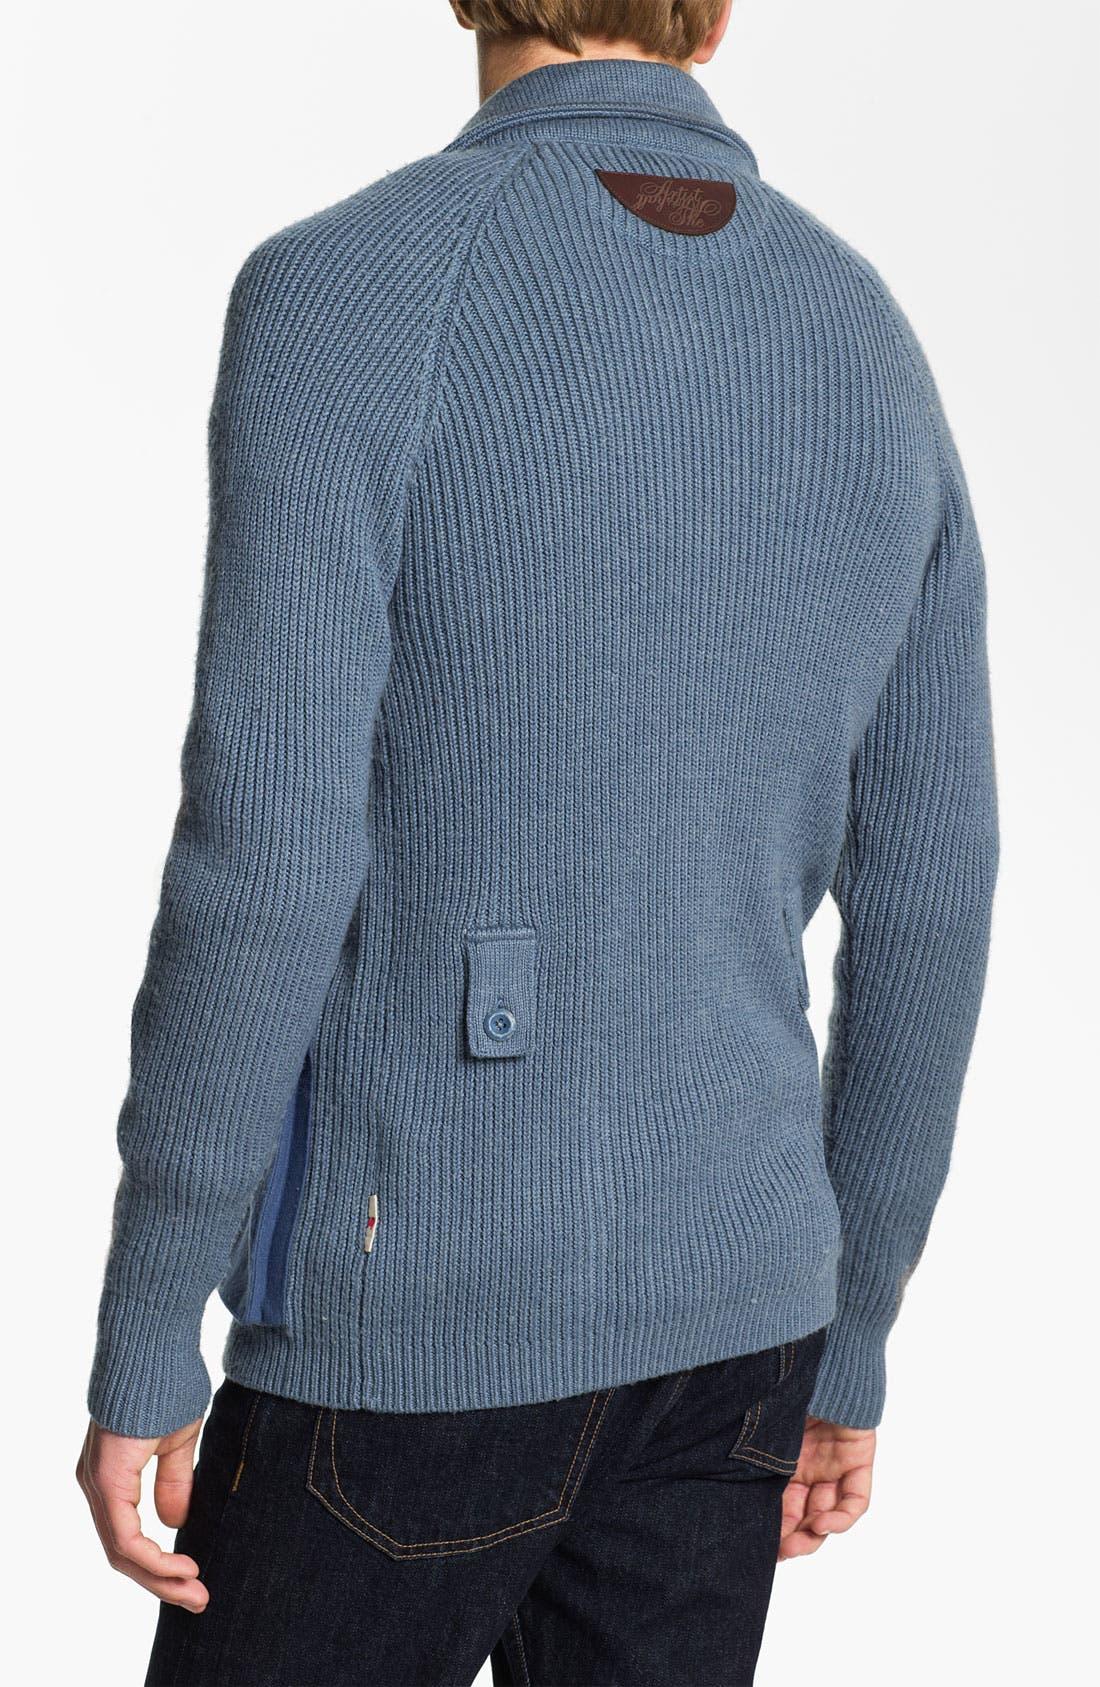 Alternate Image 2  - Marshall Artist 'Officer's' Wool Blend Cardigan